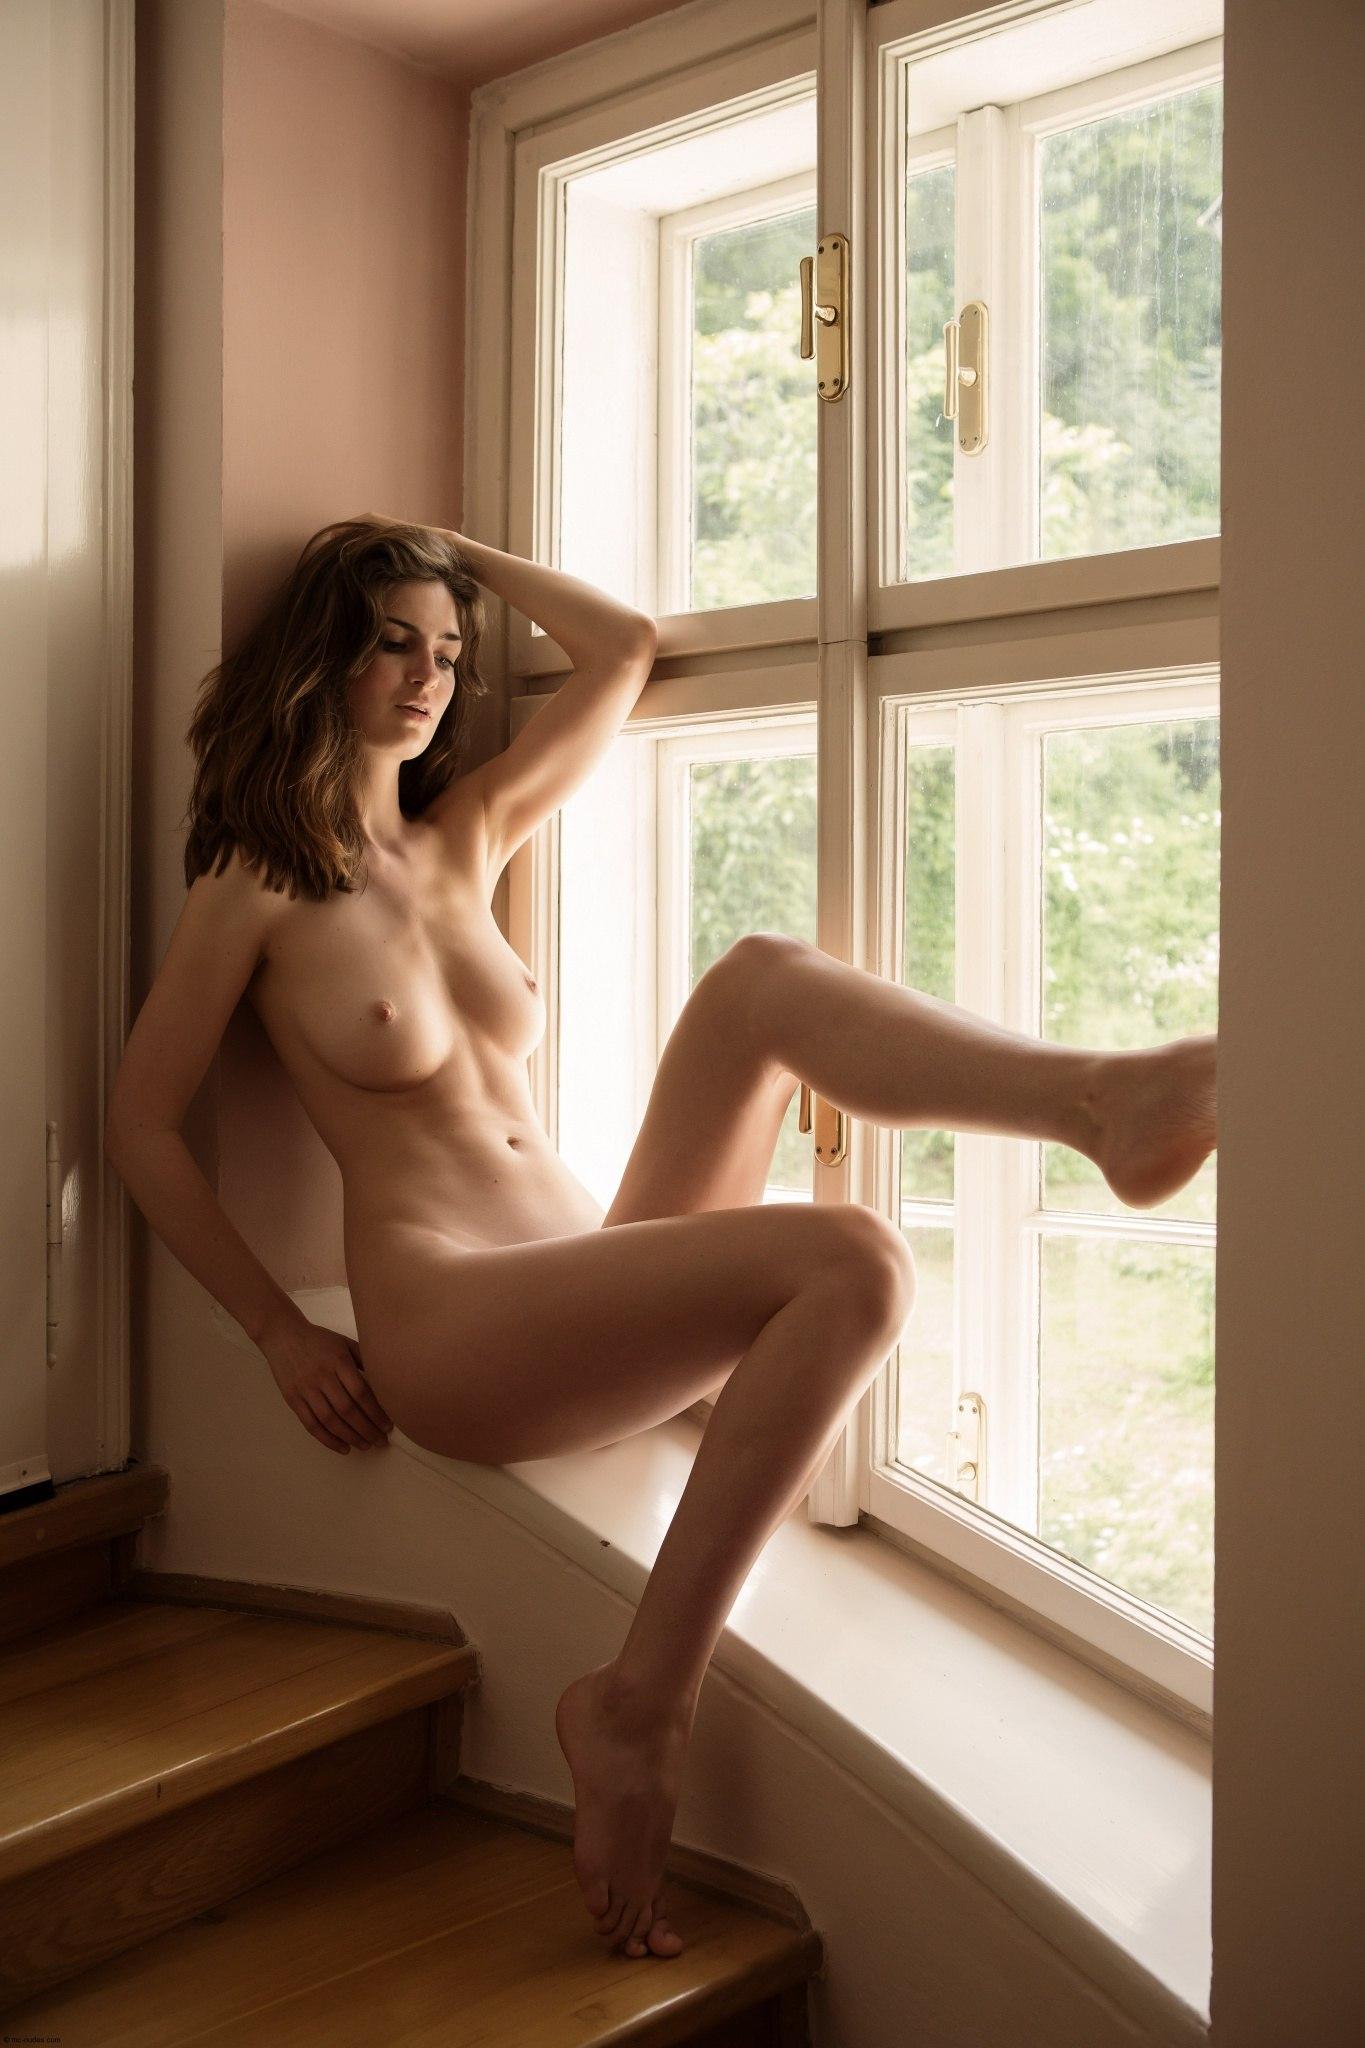 Эротика у окна фото 3 фотография